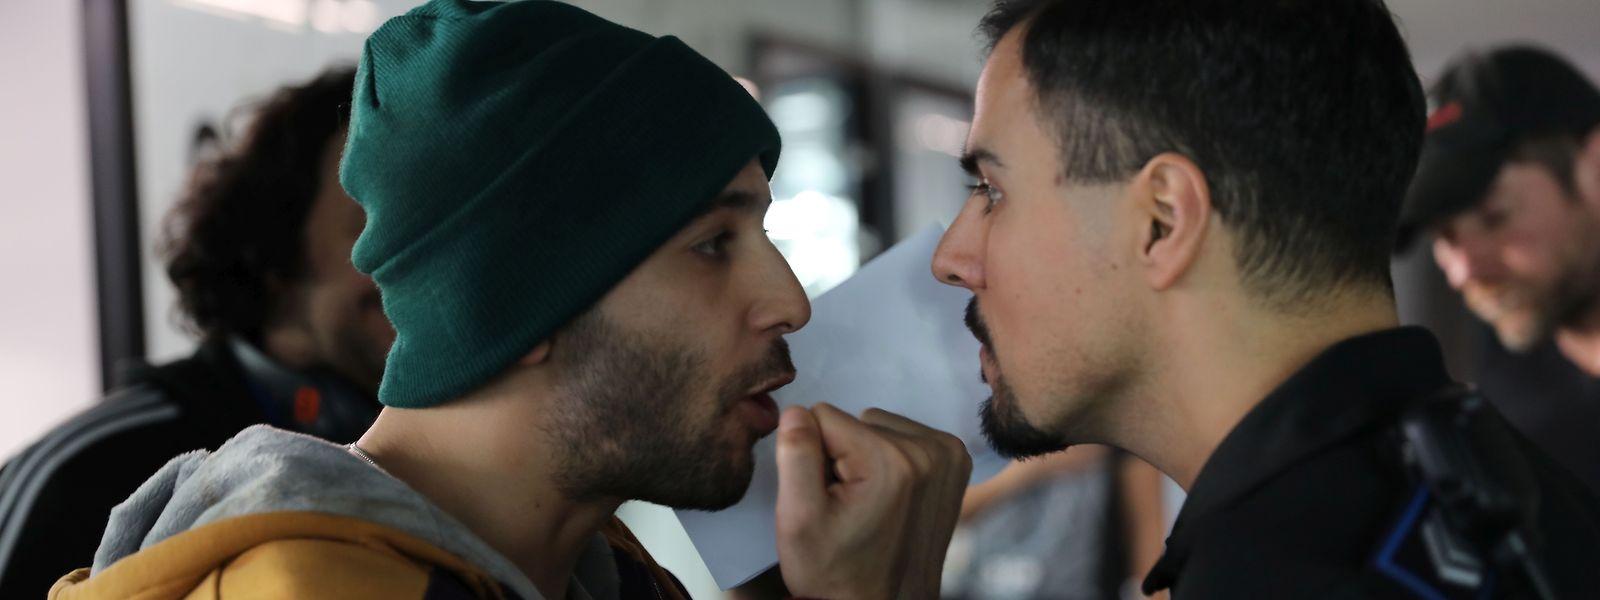 DJ Skaarab (Karim Kassem) gerät mit dem Luxemburger Polizisten Miguel (Nilton Martins) aneinander.